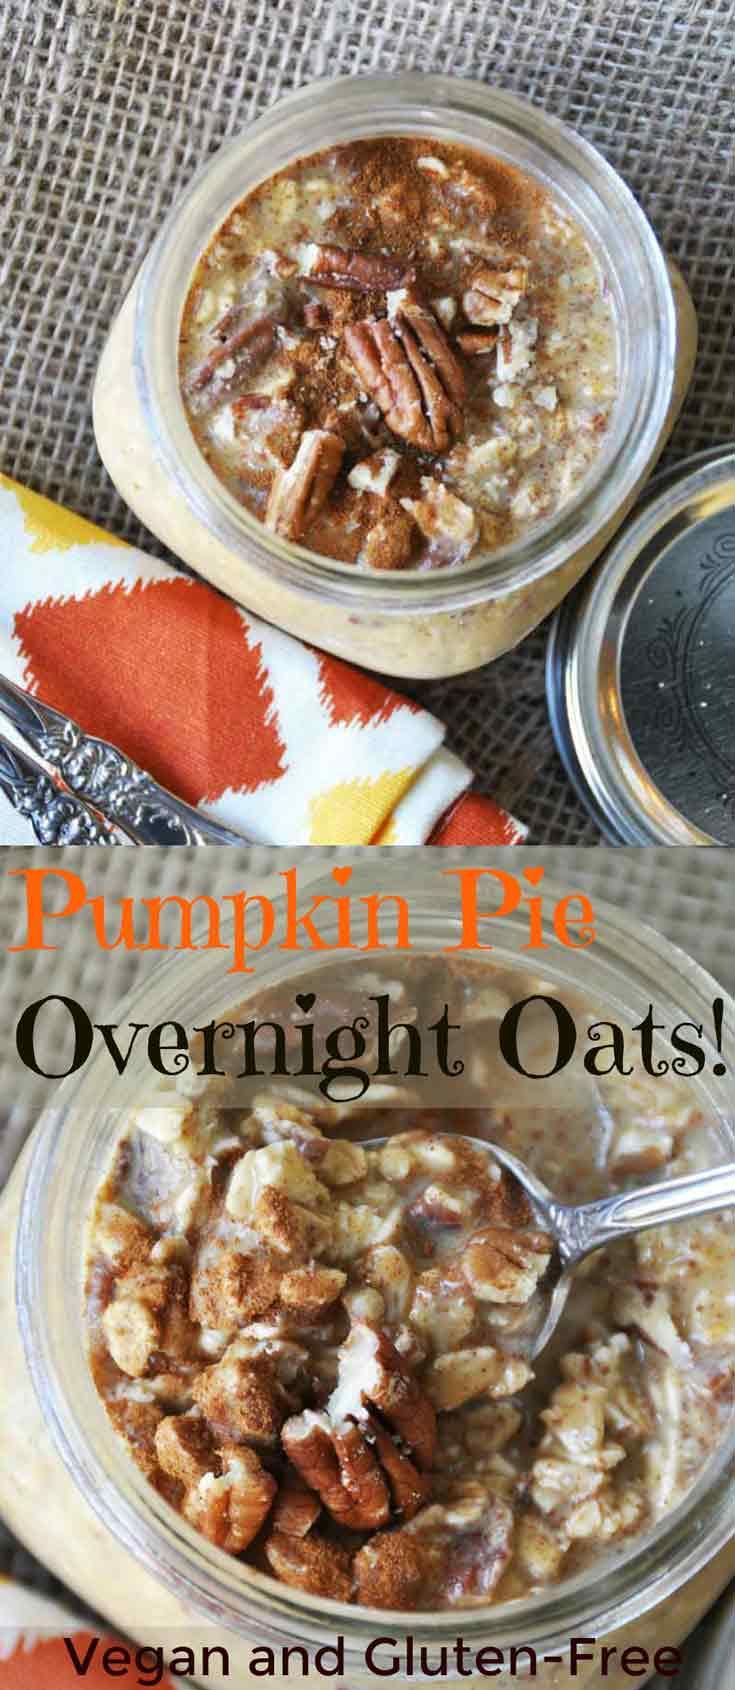 Easy, vegan, gluten-free pumpkin pie overnight oats! It's like having dessert for breakfast! www.veganosity.com